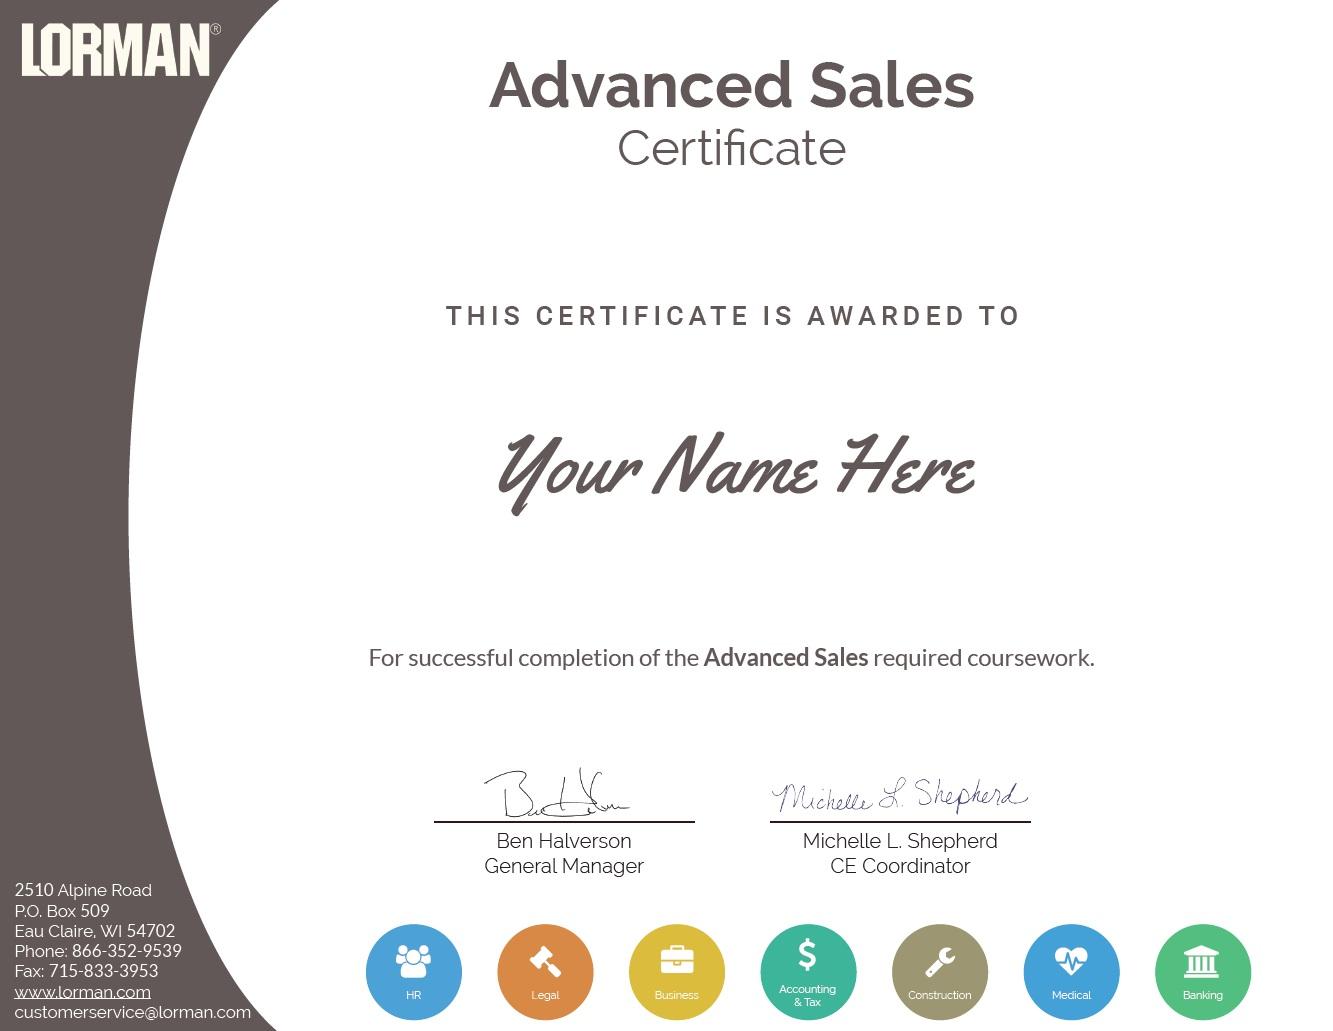 Advanced Sales Certificate